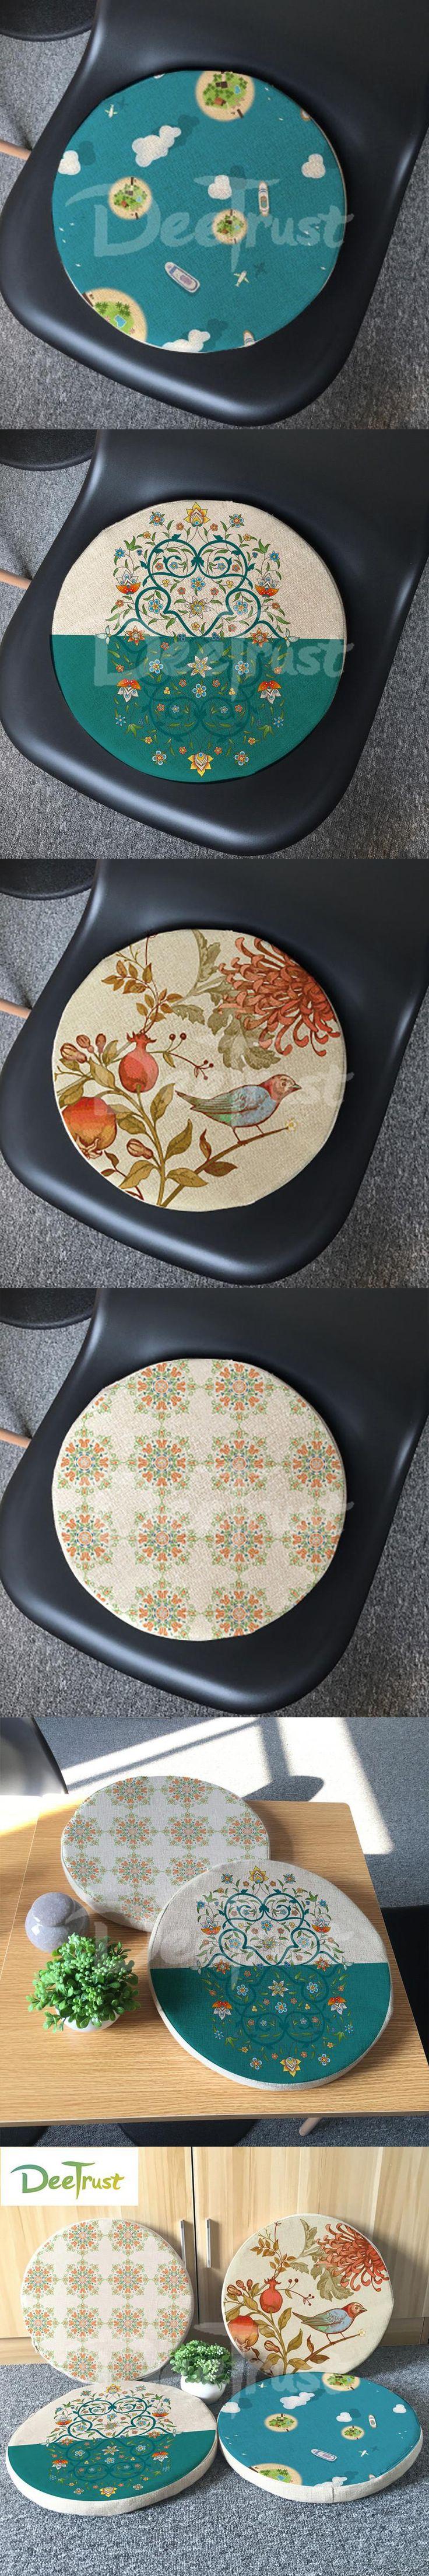 Japanese Cotton Linen Futon Round Seat Cushion Thick PP Cotton Balcony Window Pillow Flower Bird Tatami Washable Cojines Silla